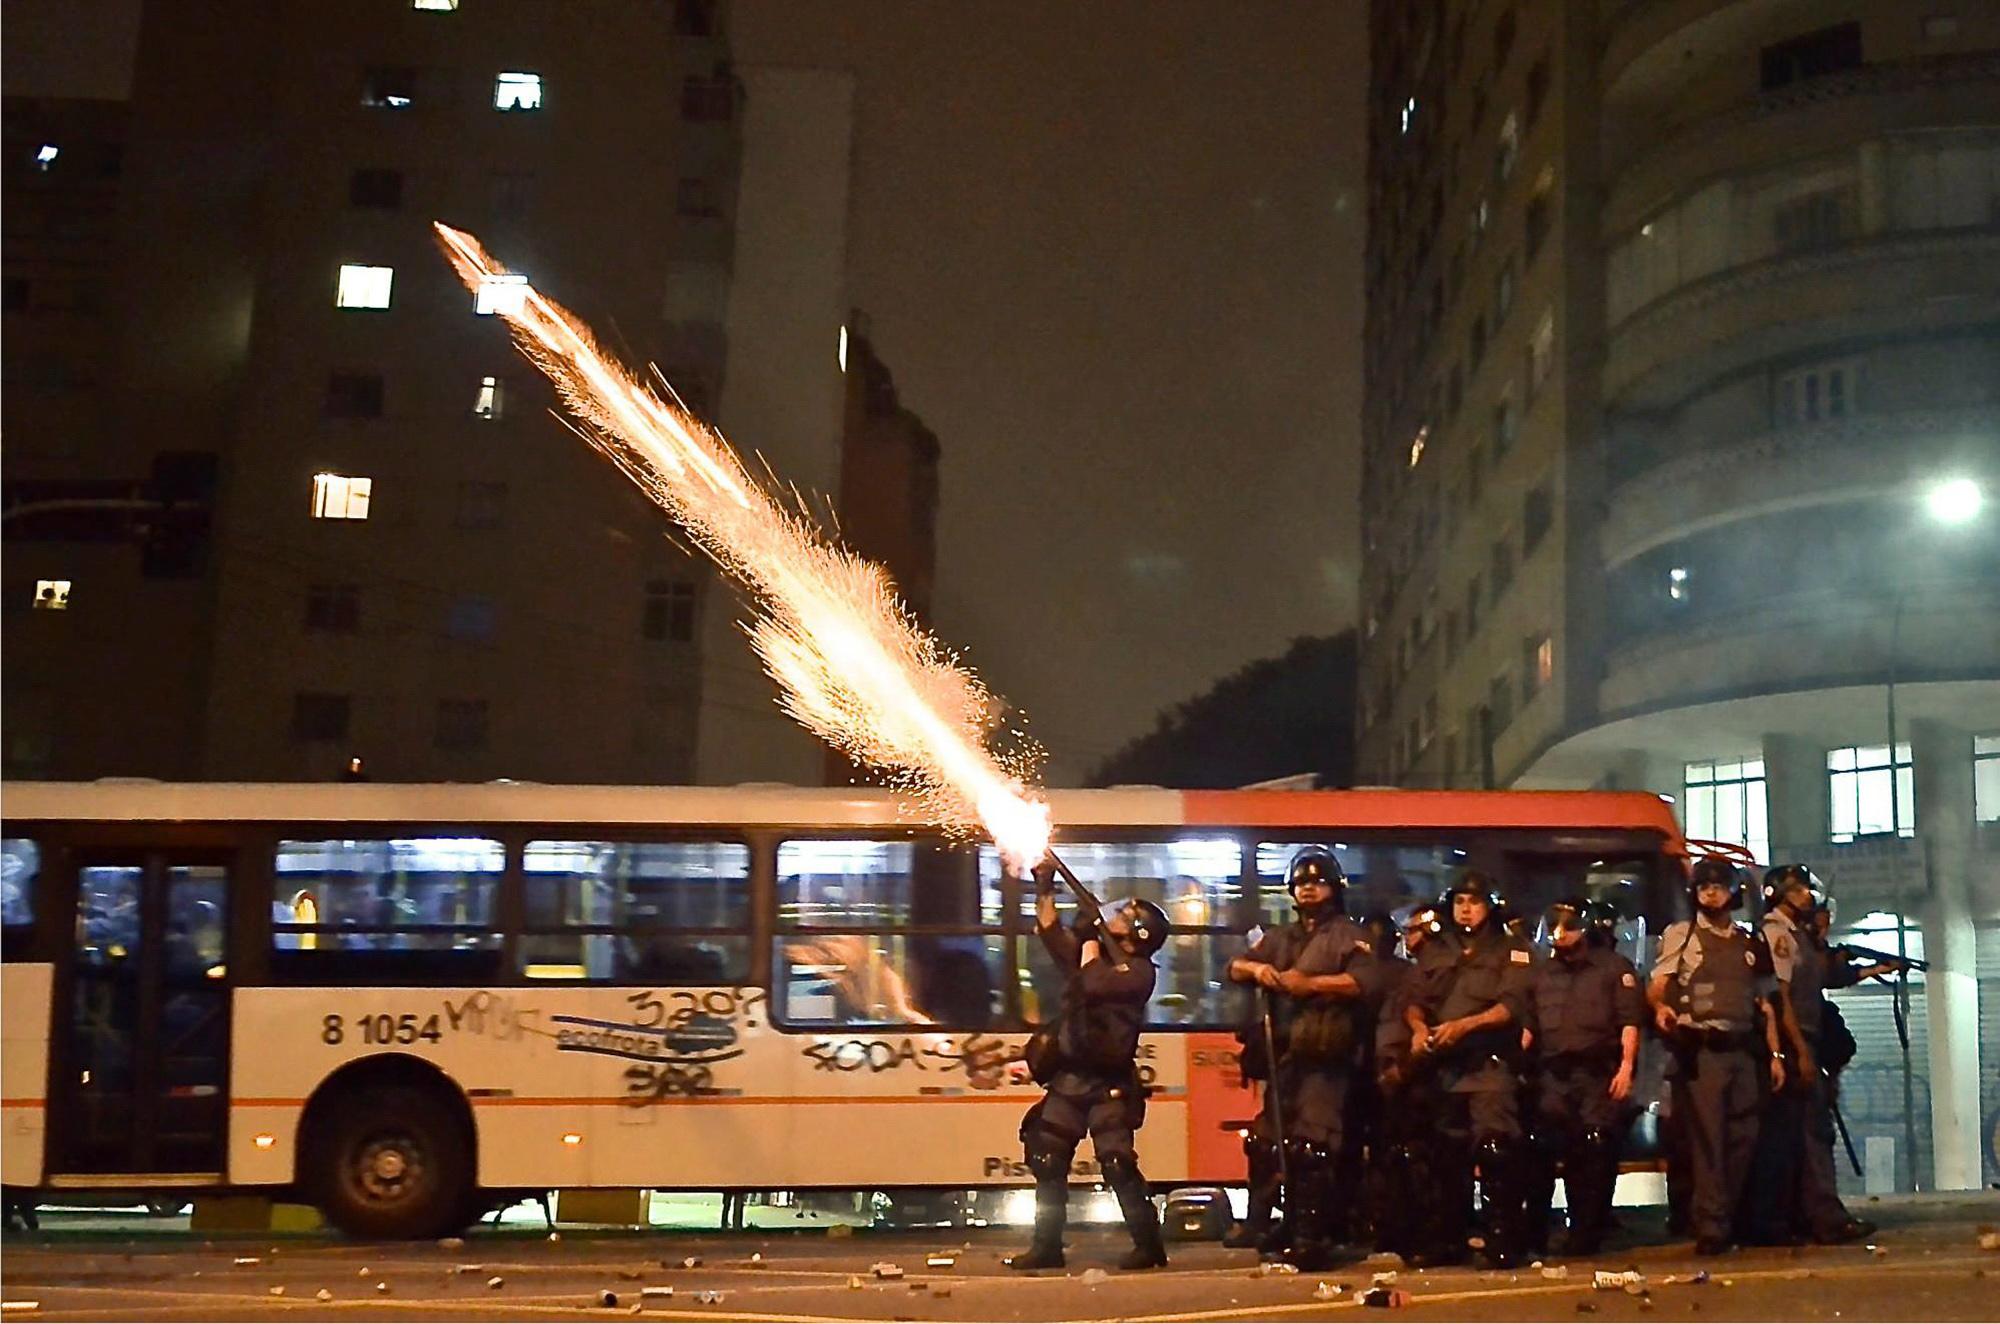 fotos-ineditas-das-marchas-de-junho-2013